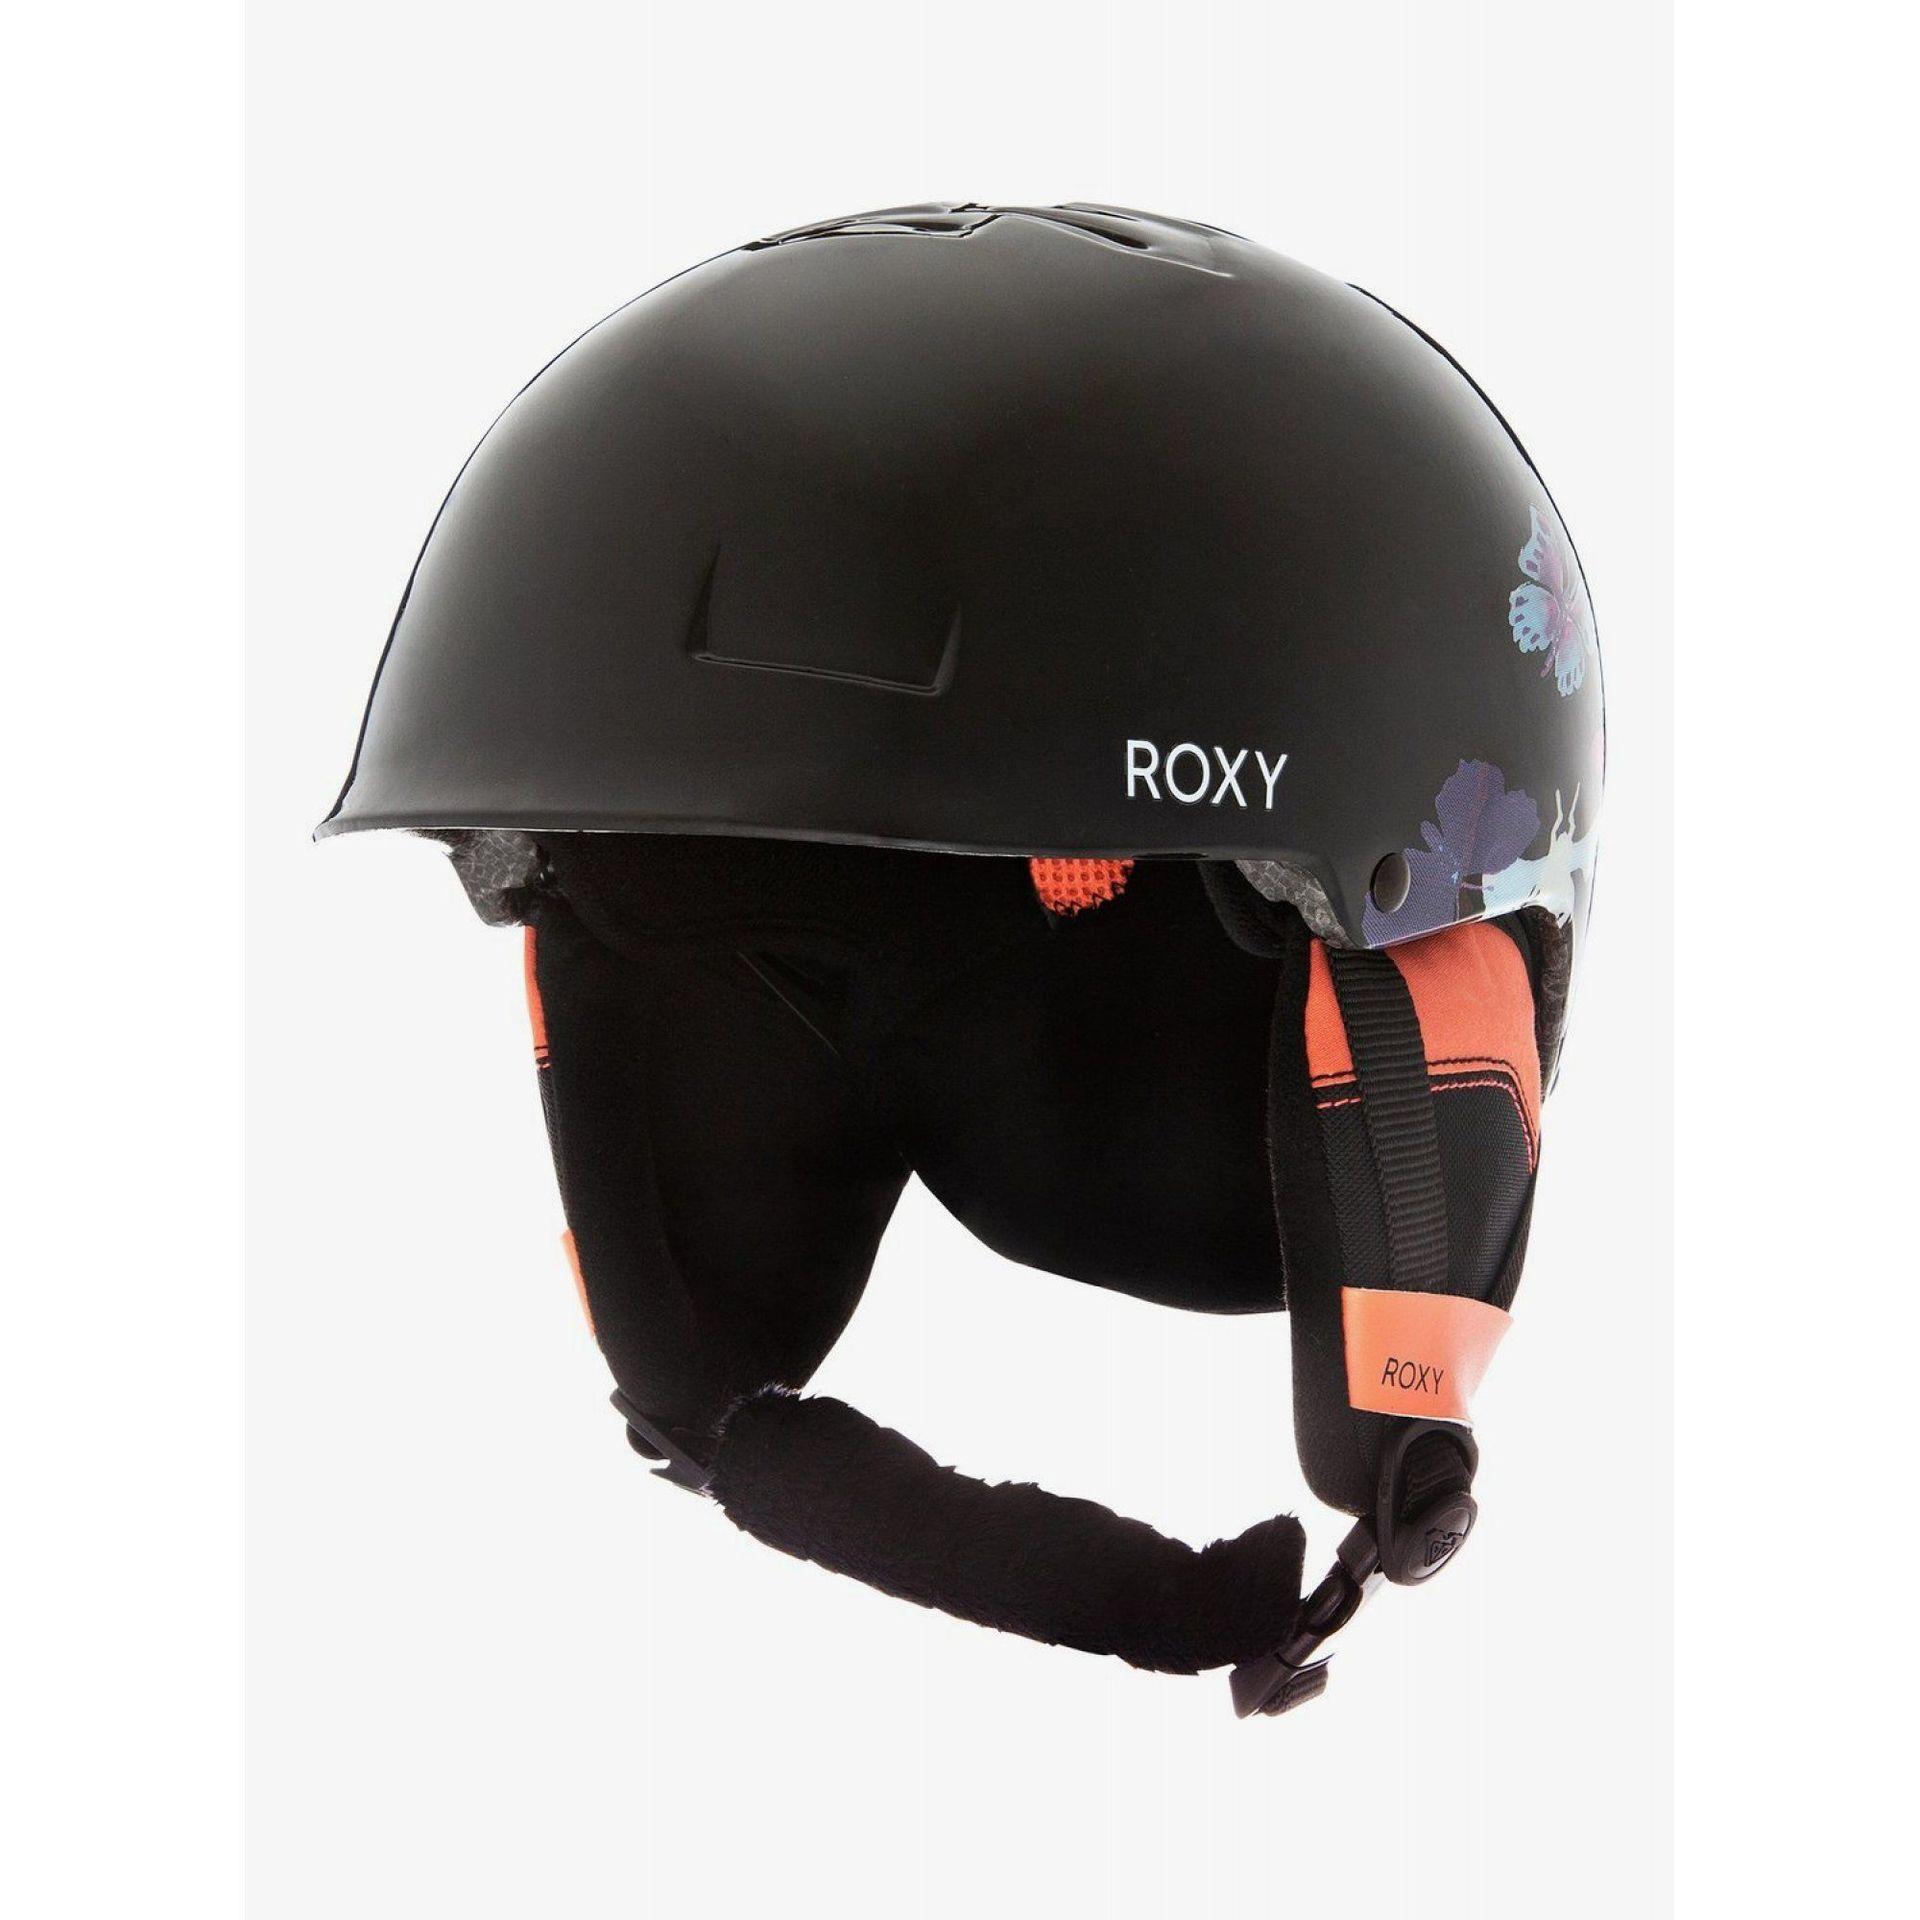 KASK ROXY HAPPYLAND ERGTL03016-KVM3 TRUE BLACK BUTTERFLY